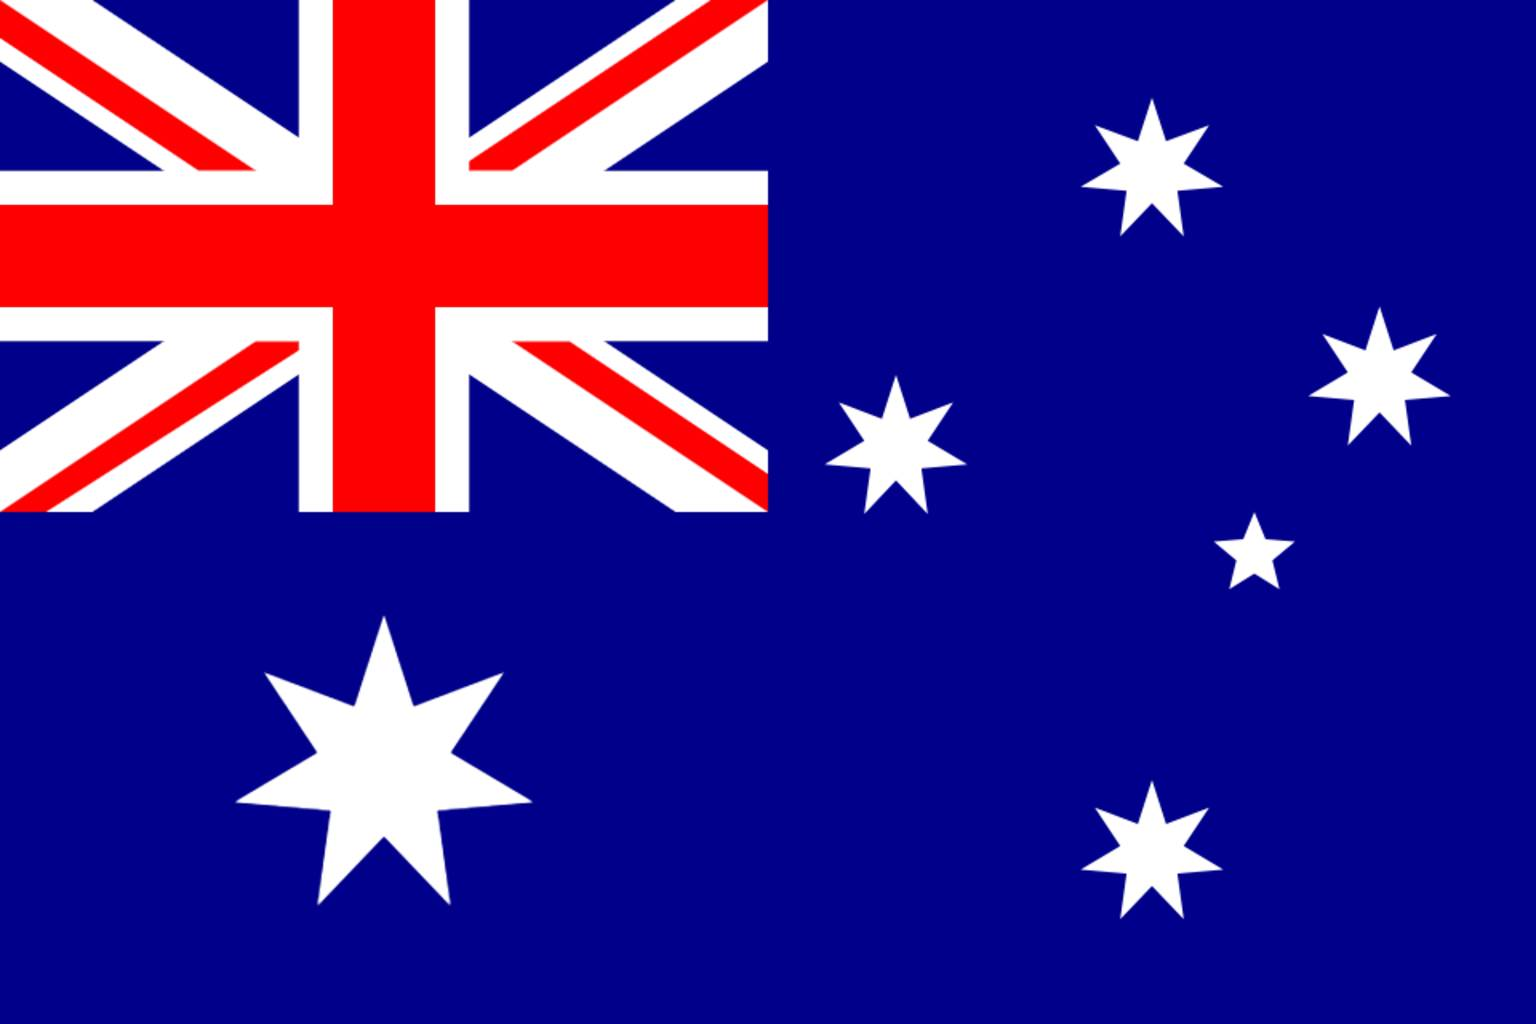 Flag-of-Australia-3-2